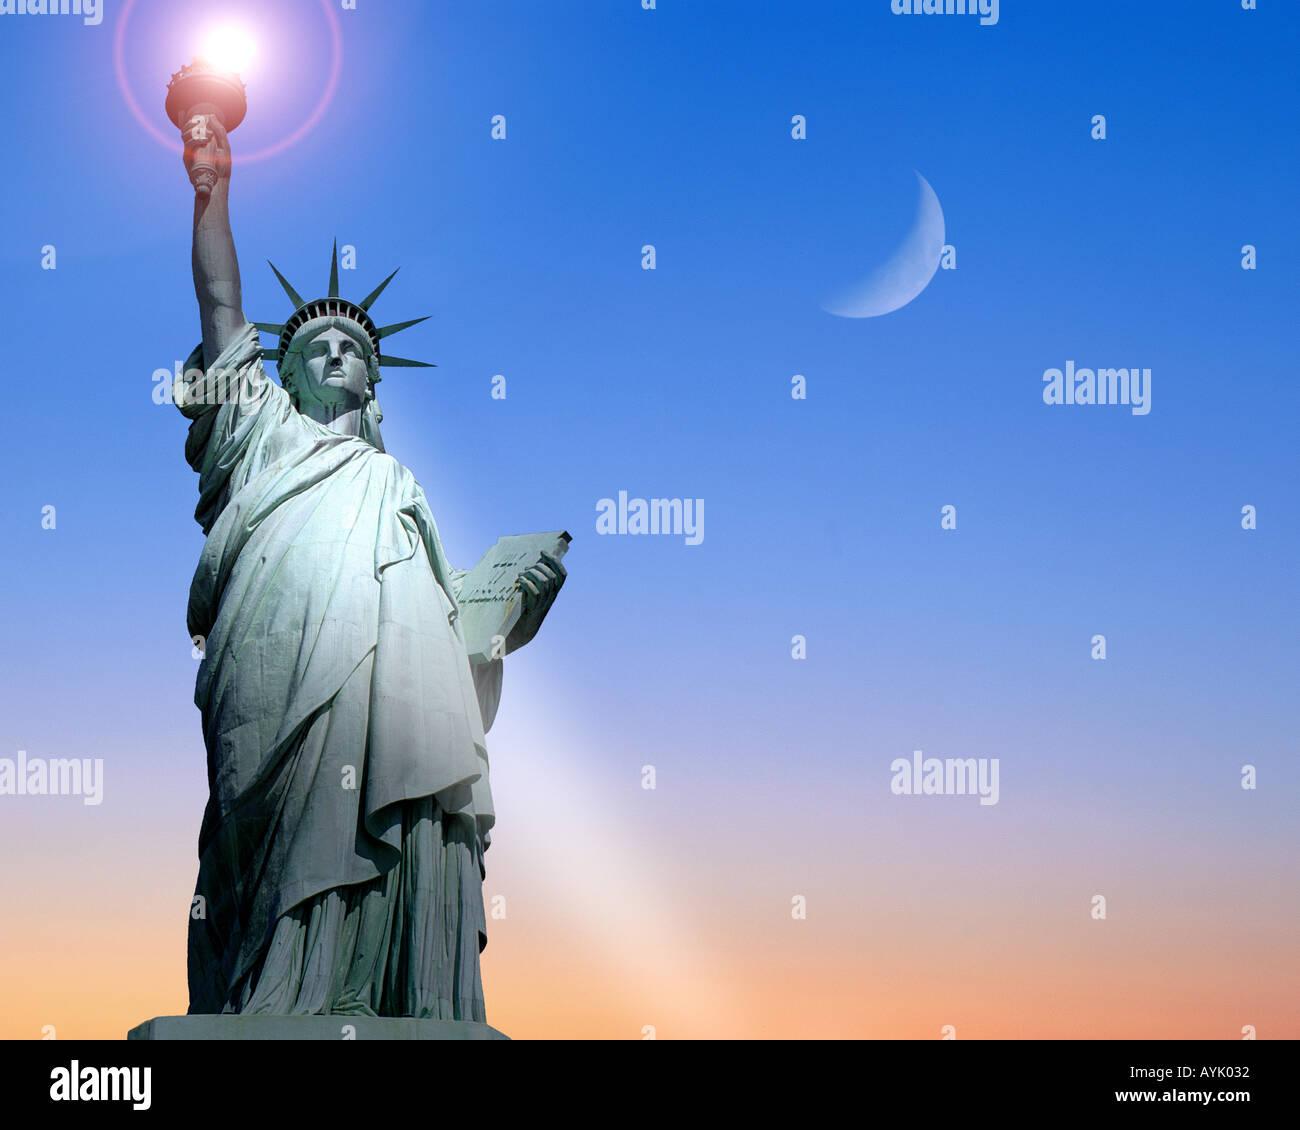 USA - NEW YORK: Freiheitsstatue auf Liberty Island Stockbild